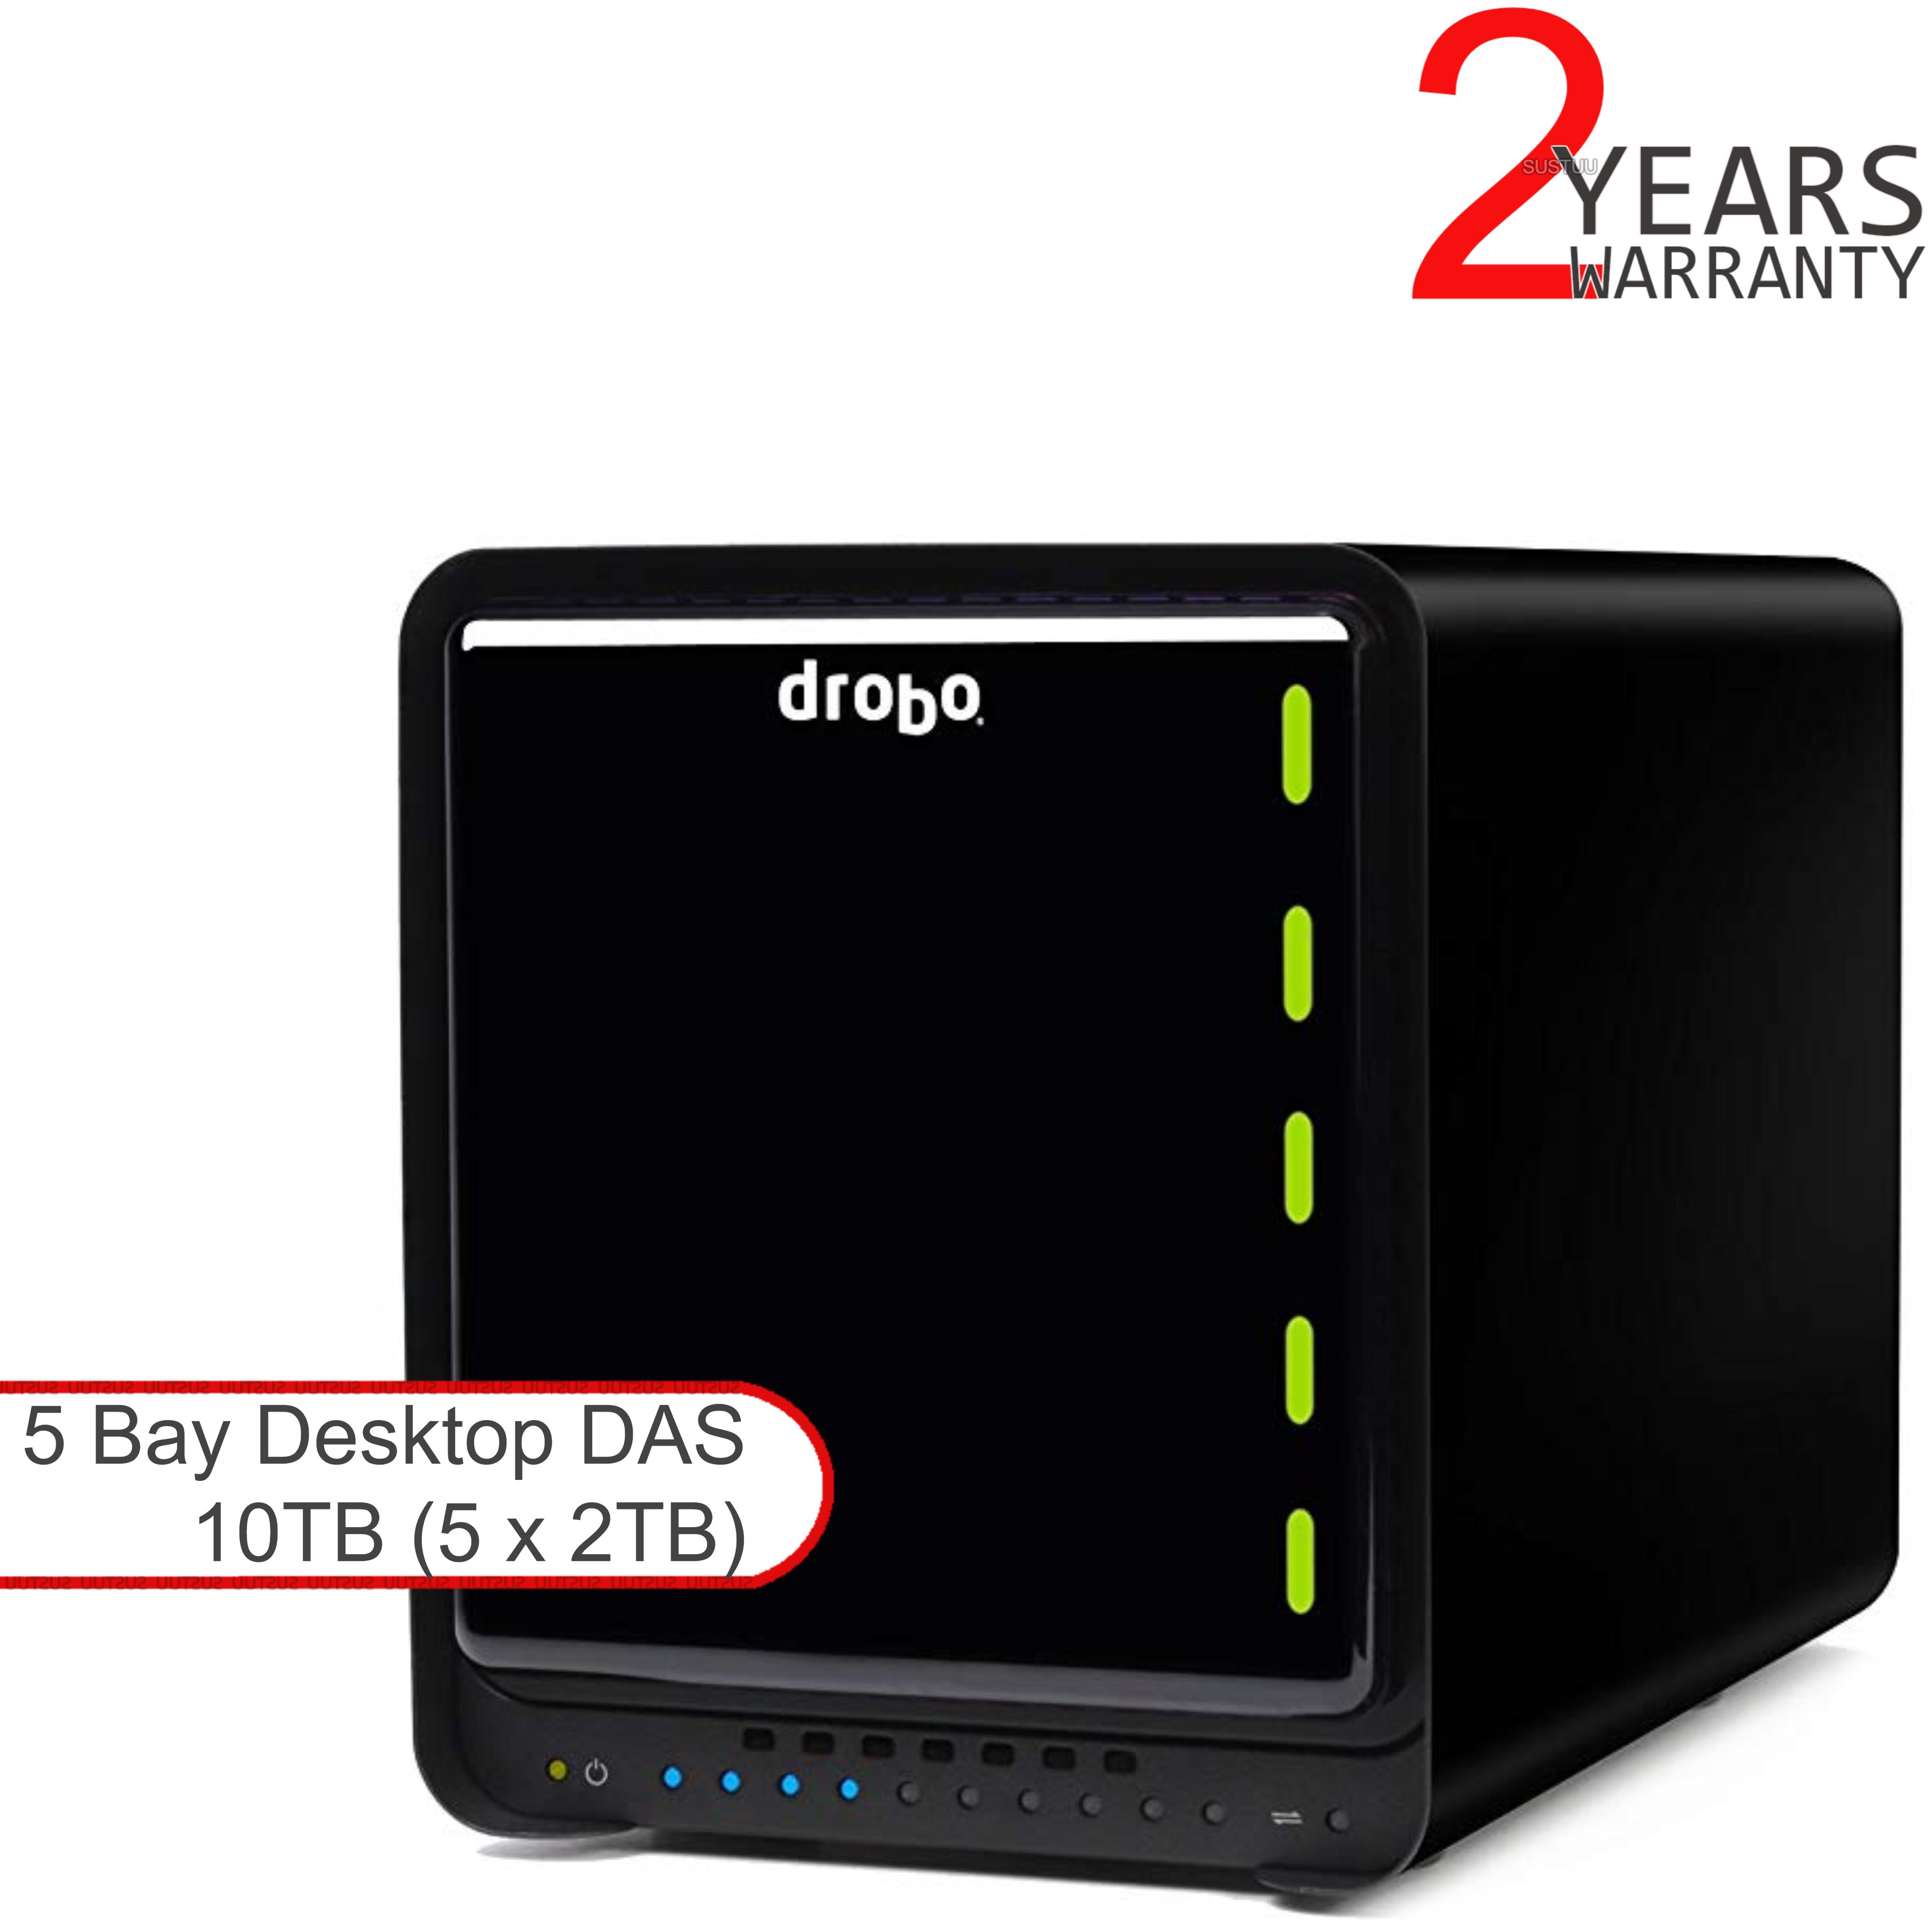 Drobo DDR4A31 10TB(5x2TB WD RED) 5 Bay DAS|Secure Storage Device|USB 3.0|Type-C|